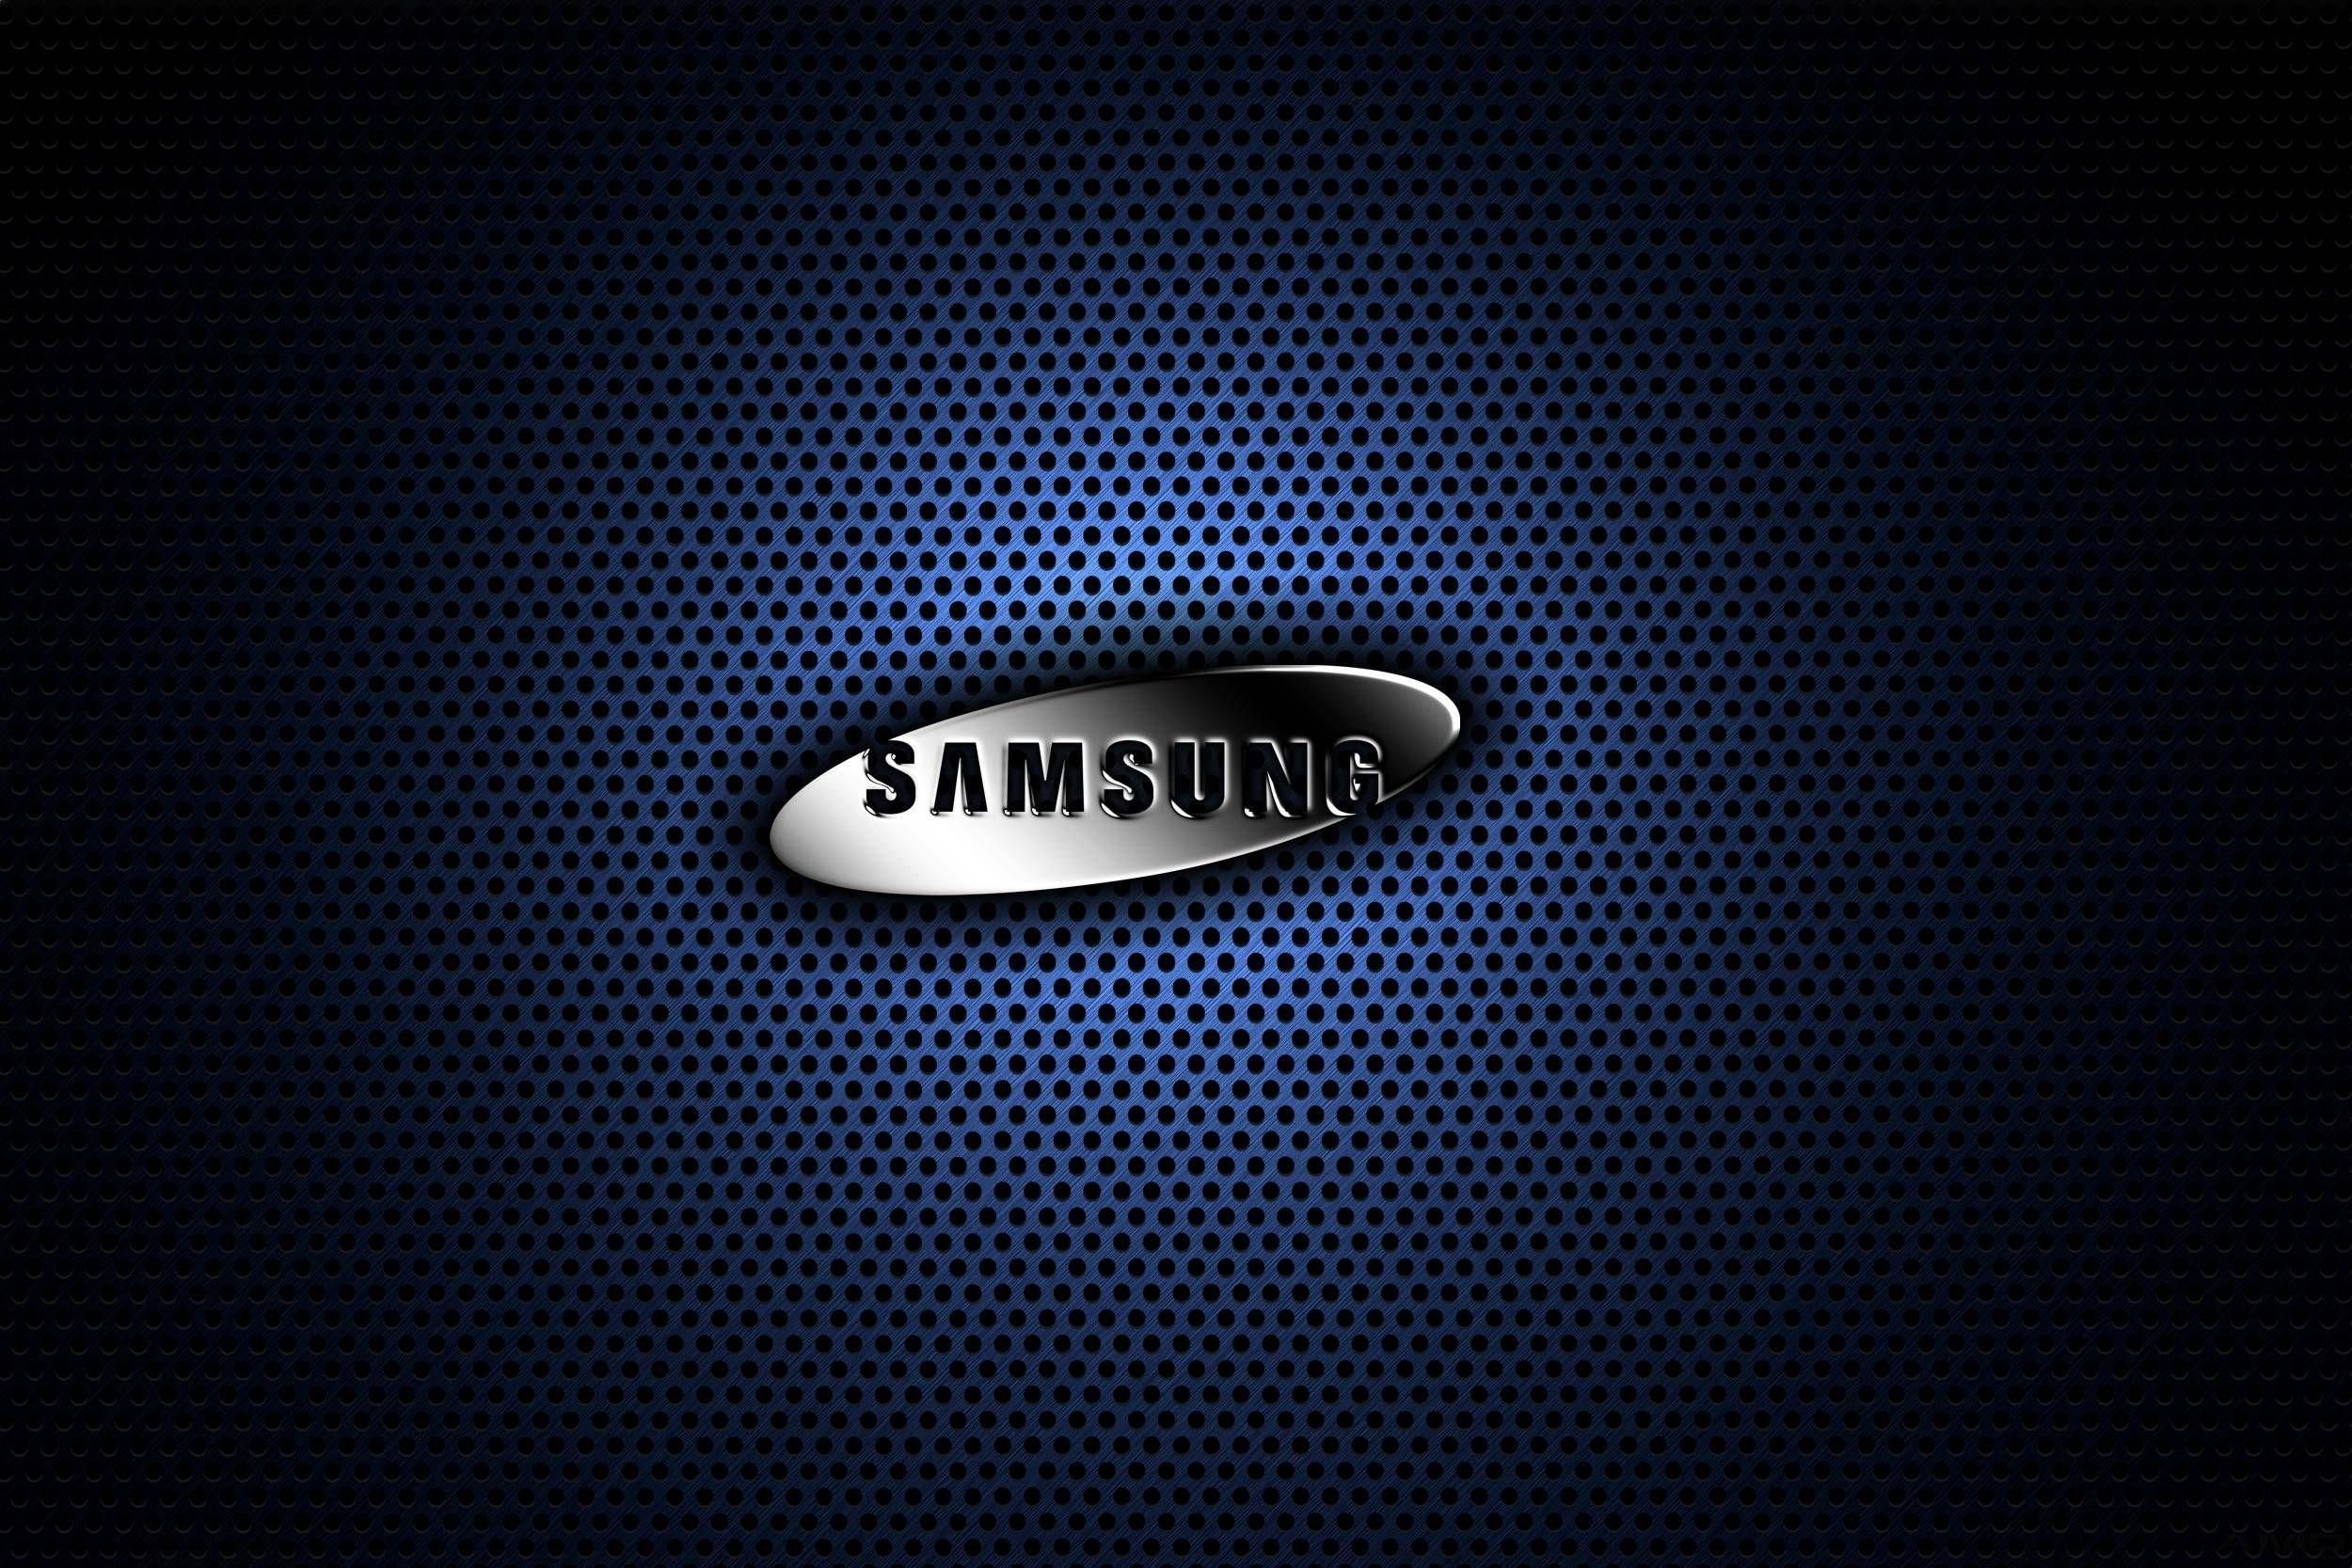 Pin By Fugen Mart On Samsung Samsung Logo Cool Wallpapers For Samsung Samsung Galaxy Wallpaper